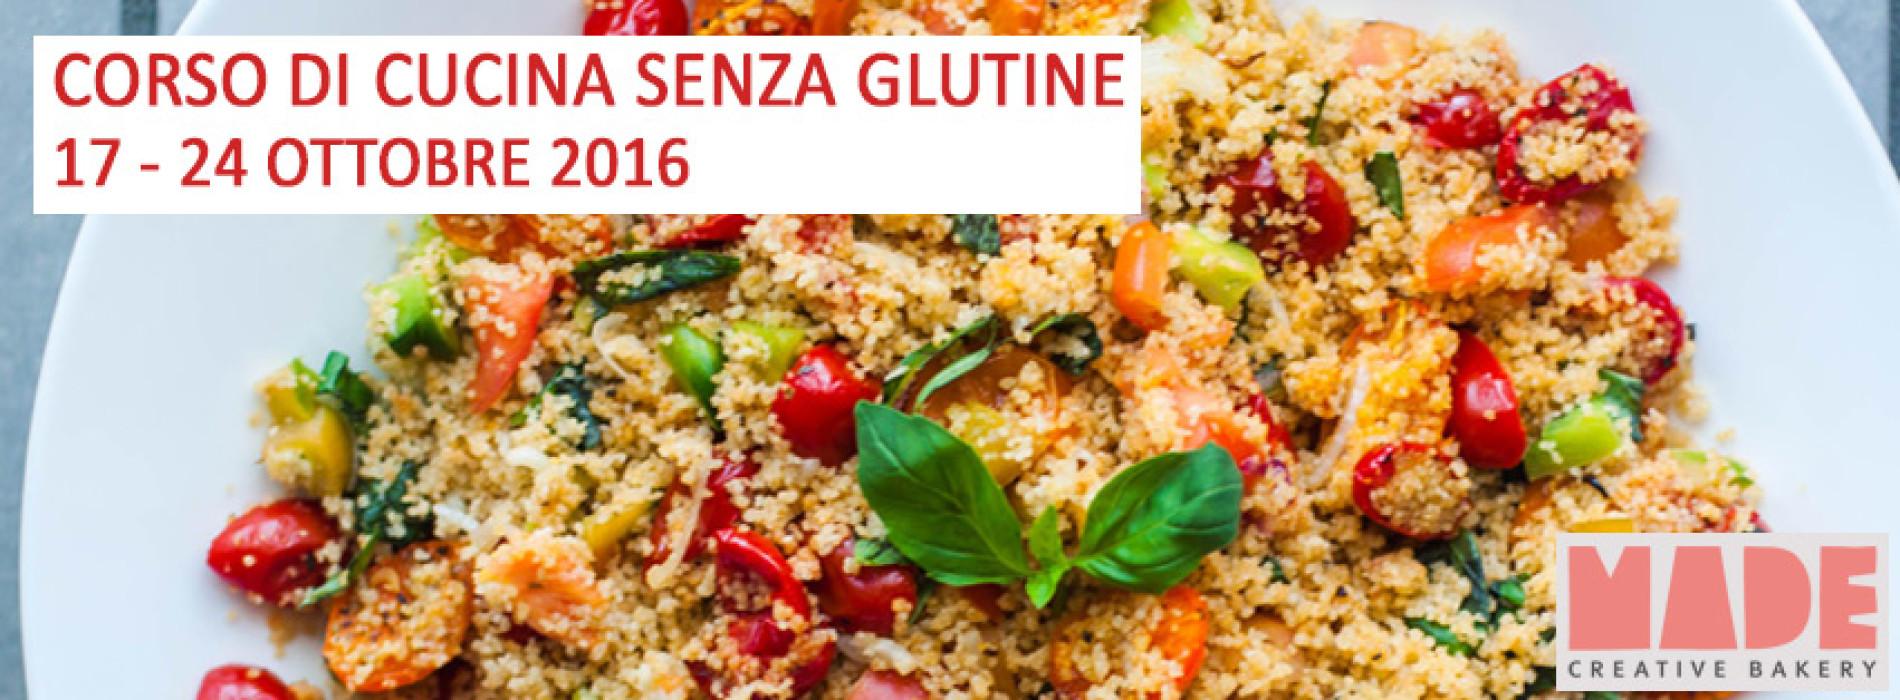 Corso di cucina senza glutine roma ottobre 2016 for Cucina 2016